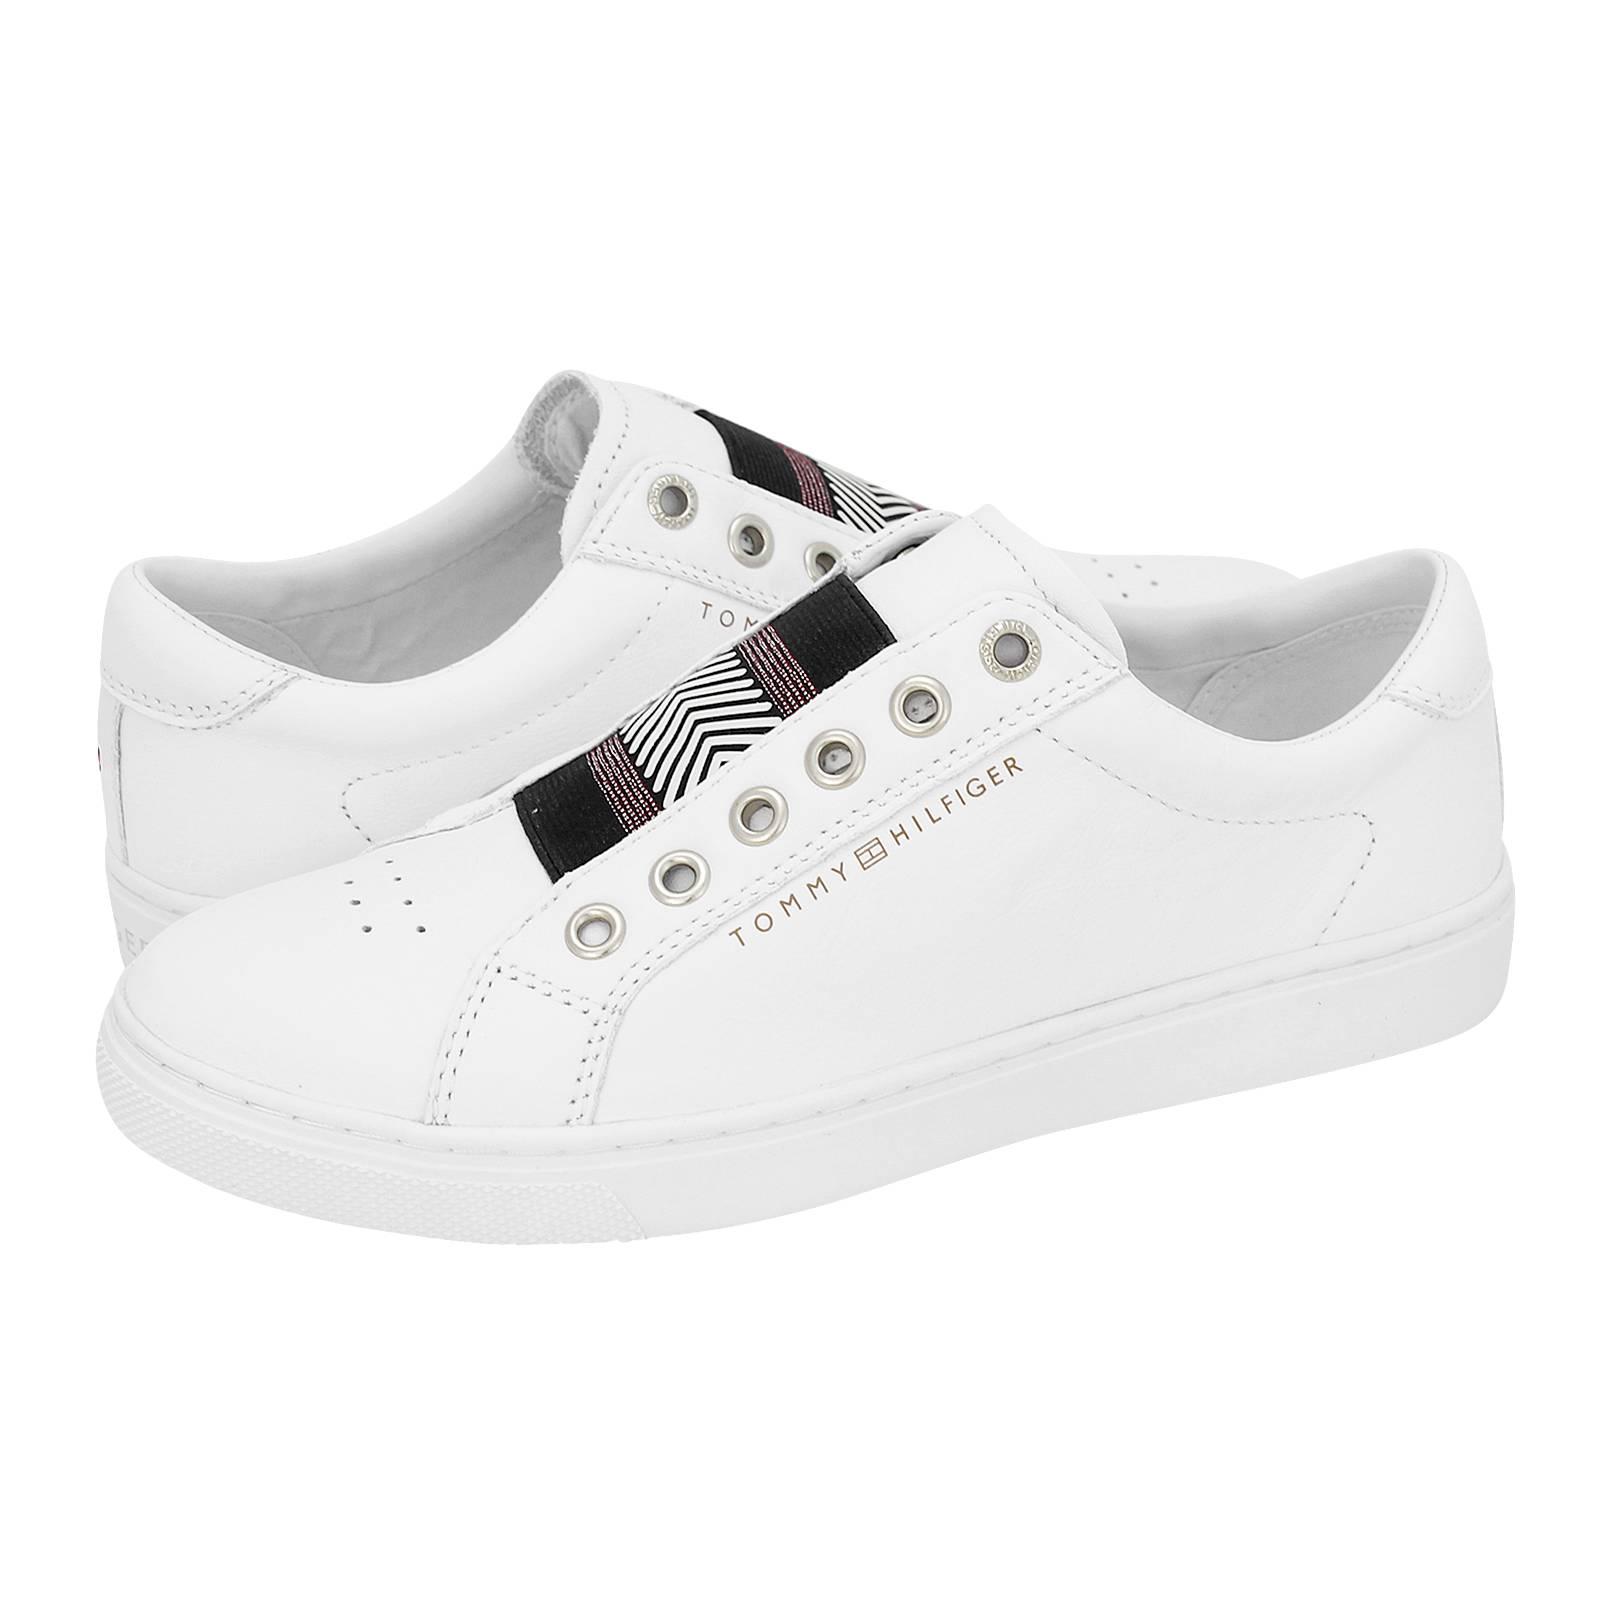 Iconic Metallic Elastic Sneaker - Γυναικεία παπούτσια casual Tommy ... 6f550e78340